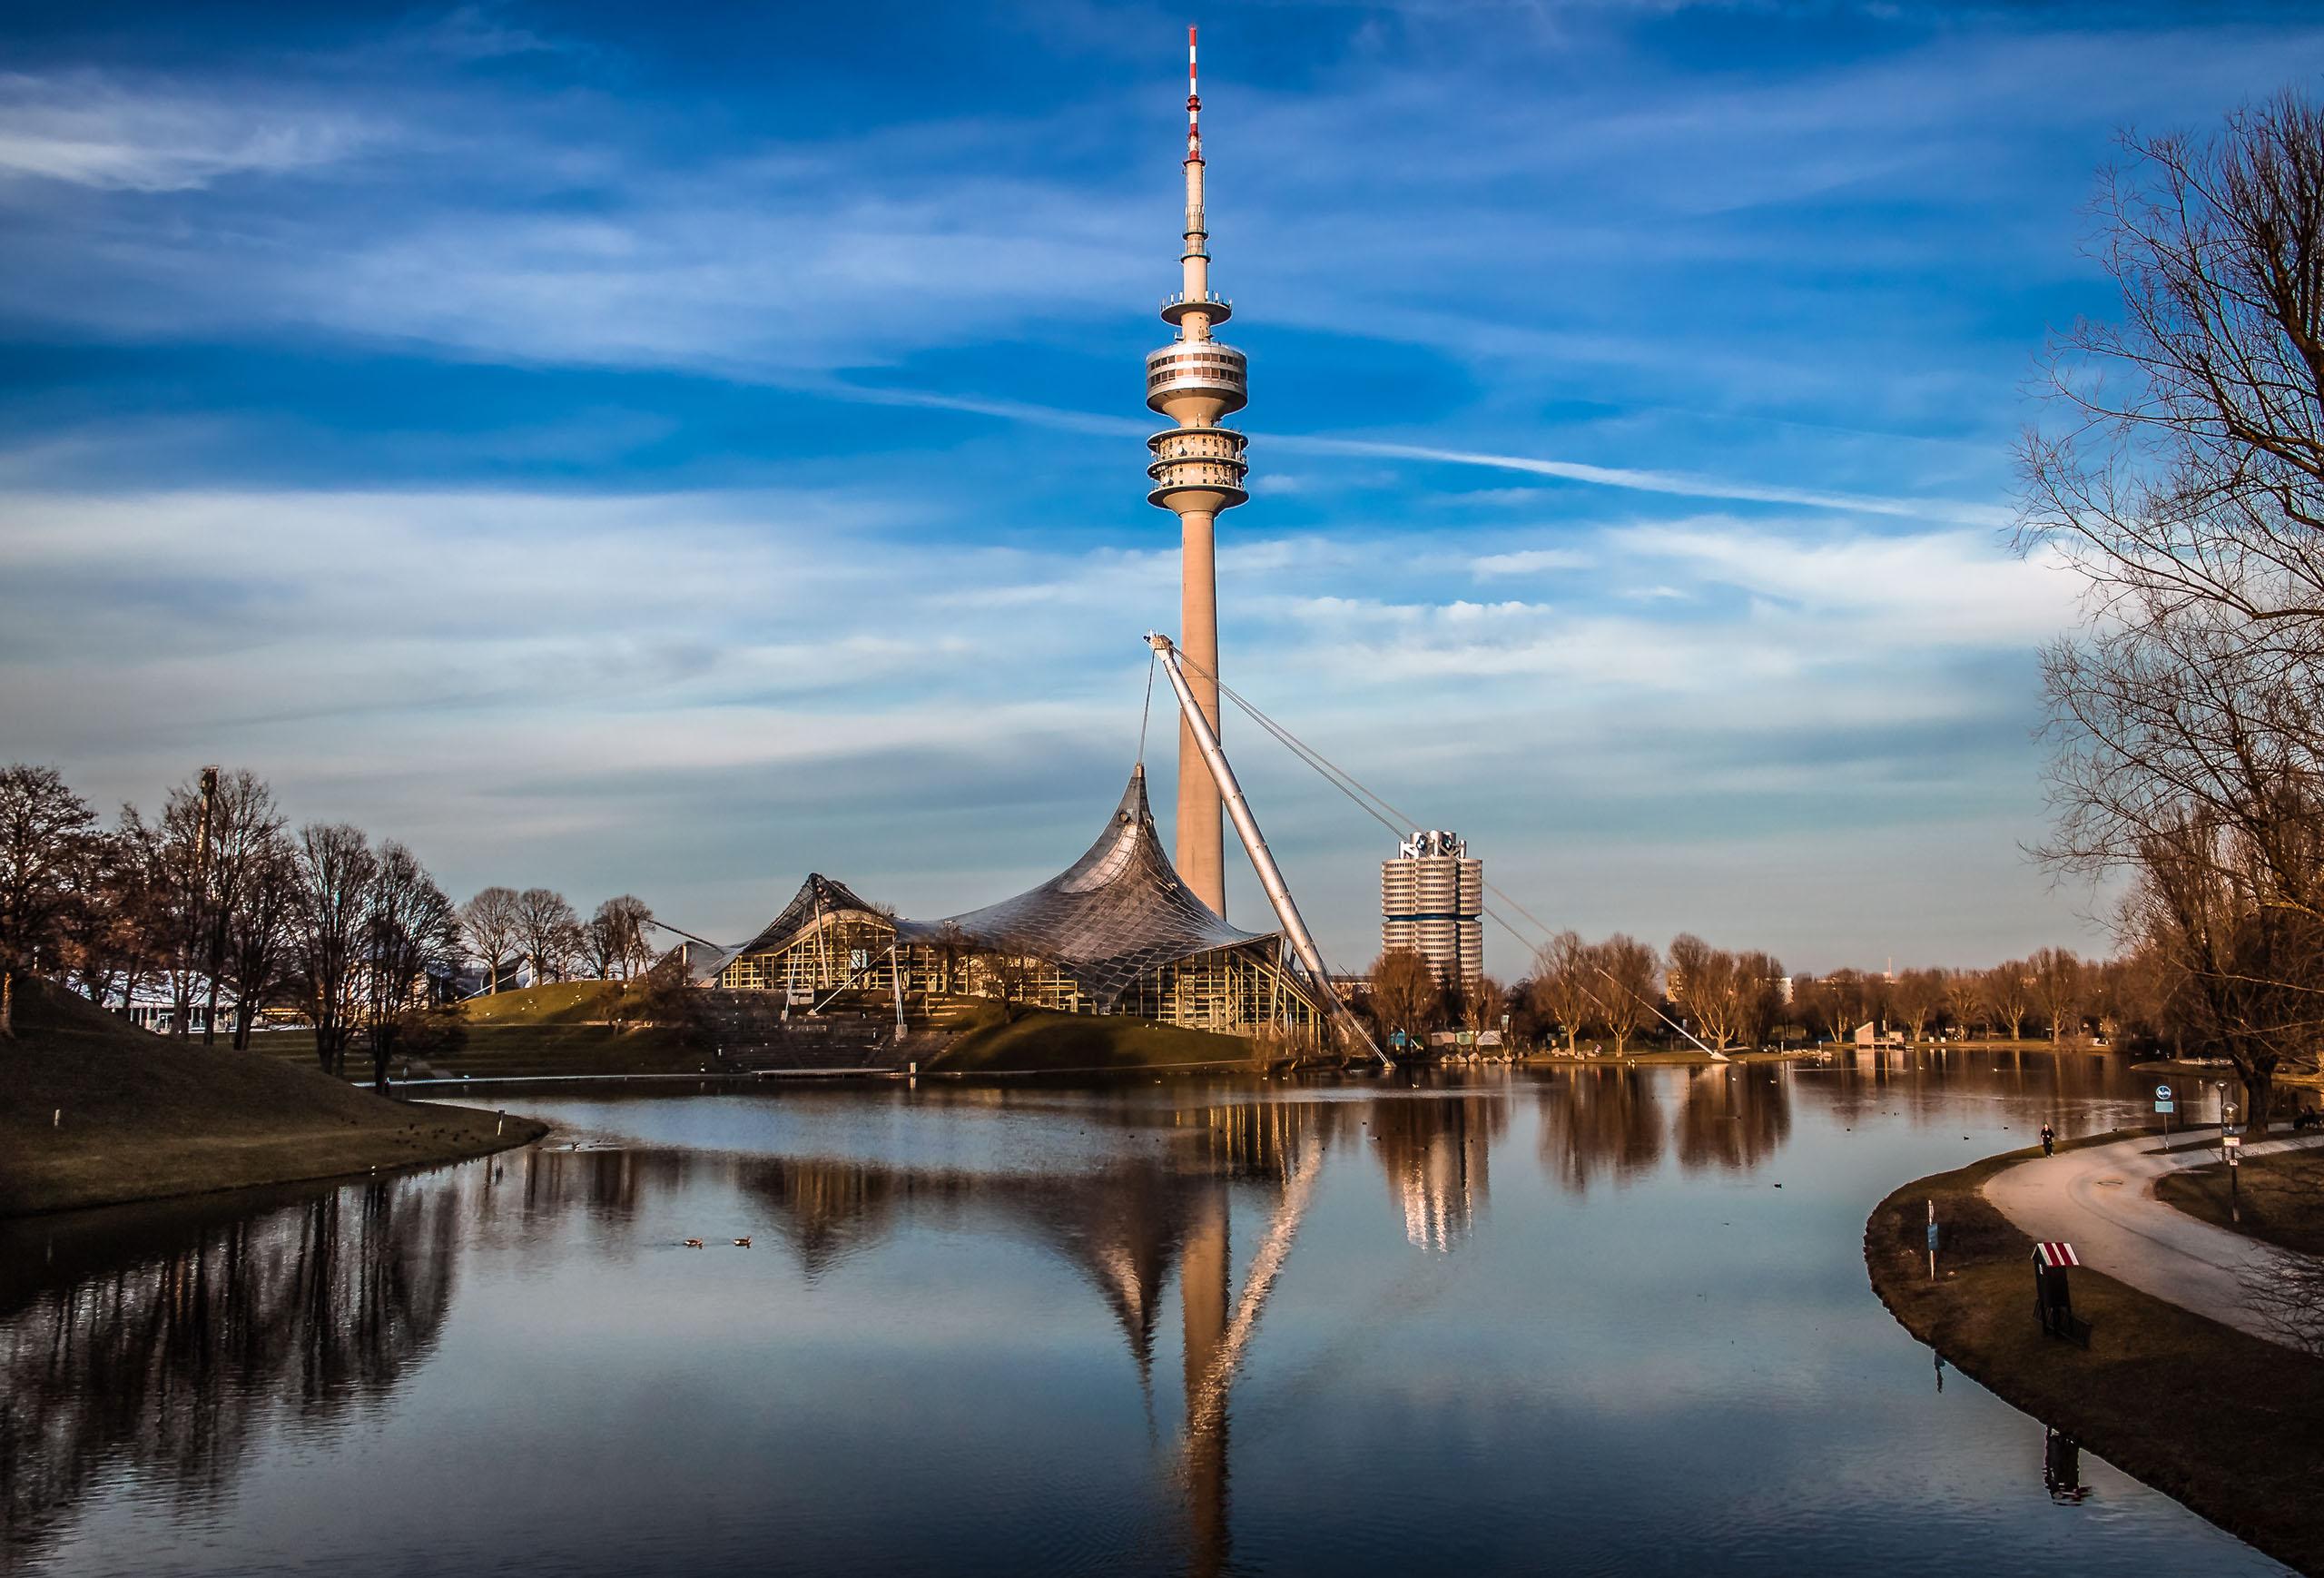 Olympiasee mit Olympiaturm im Olympiapark in München